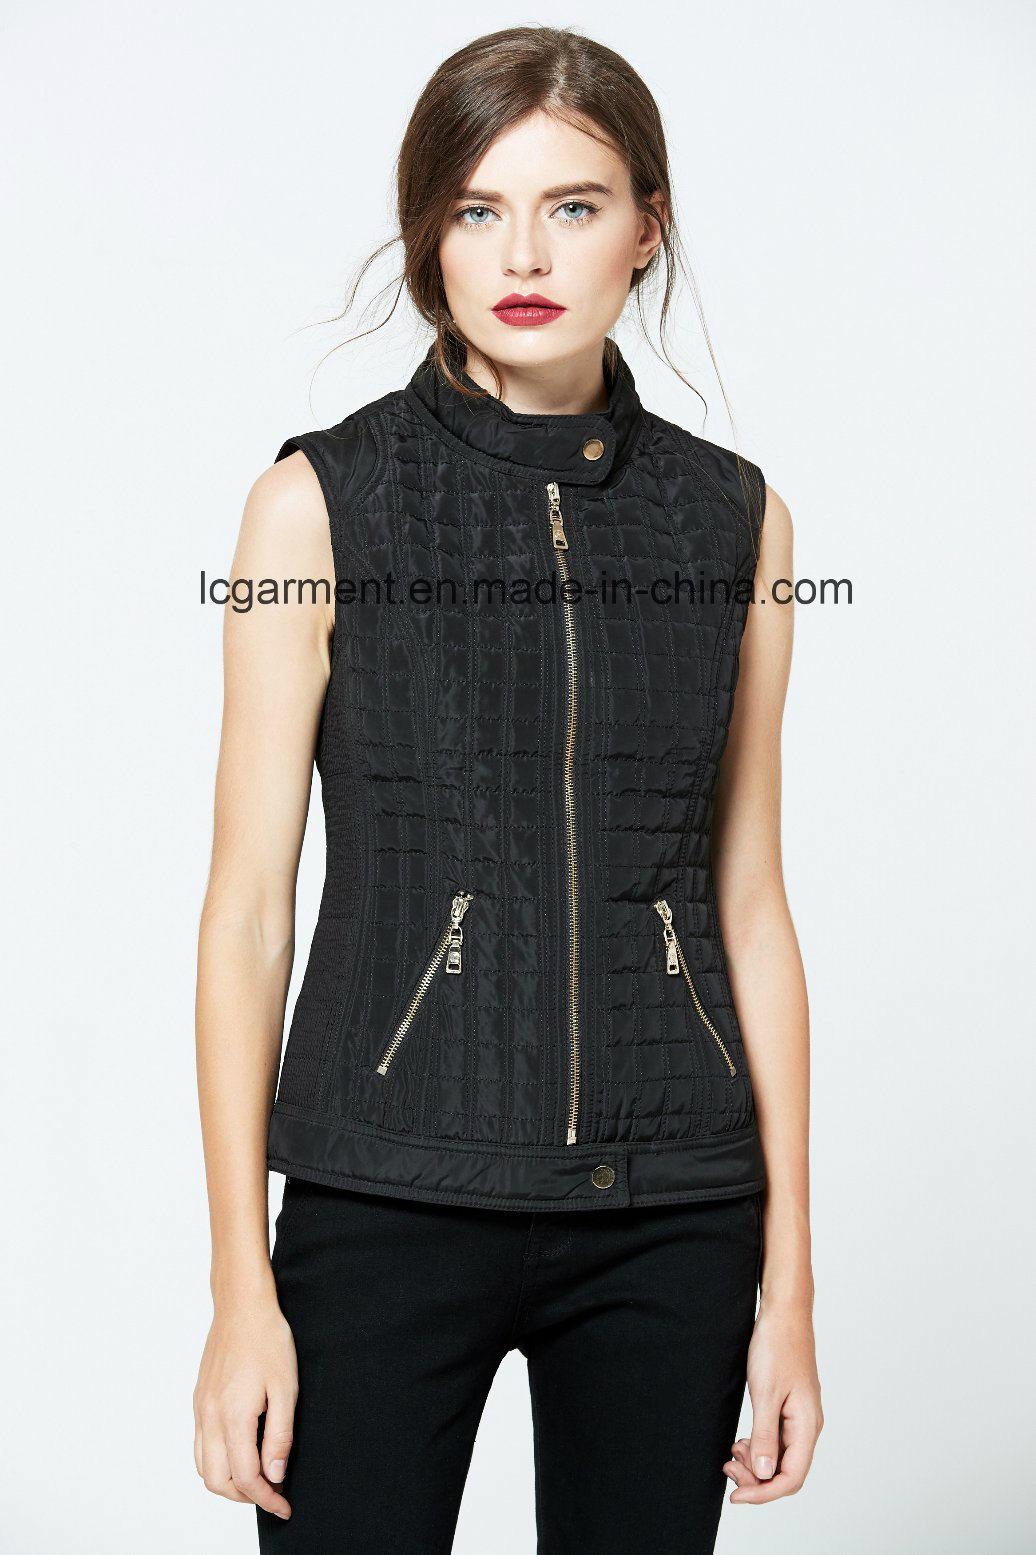 Good Quality Fashion OEM ODM Polyester Vest Winter Ladies Waistcoat